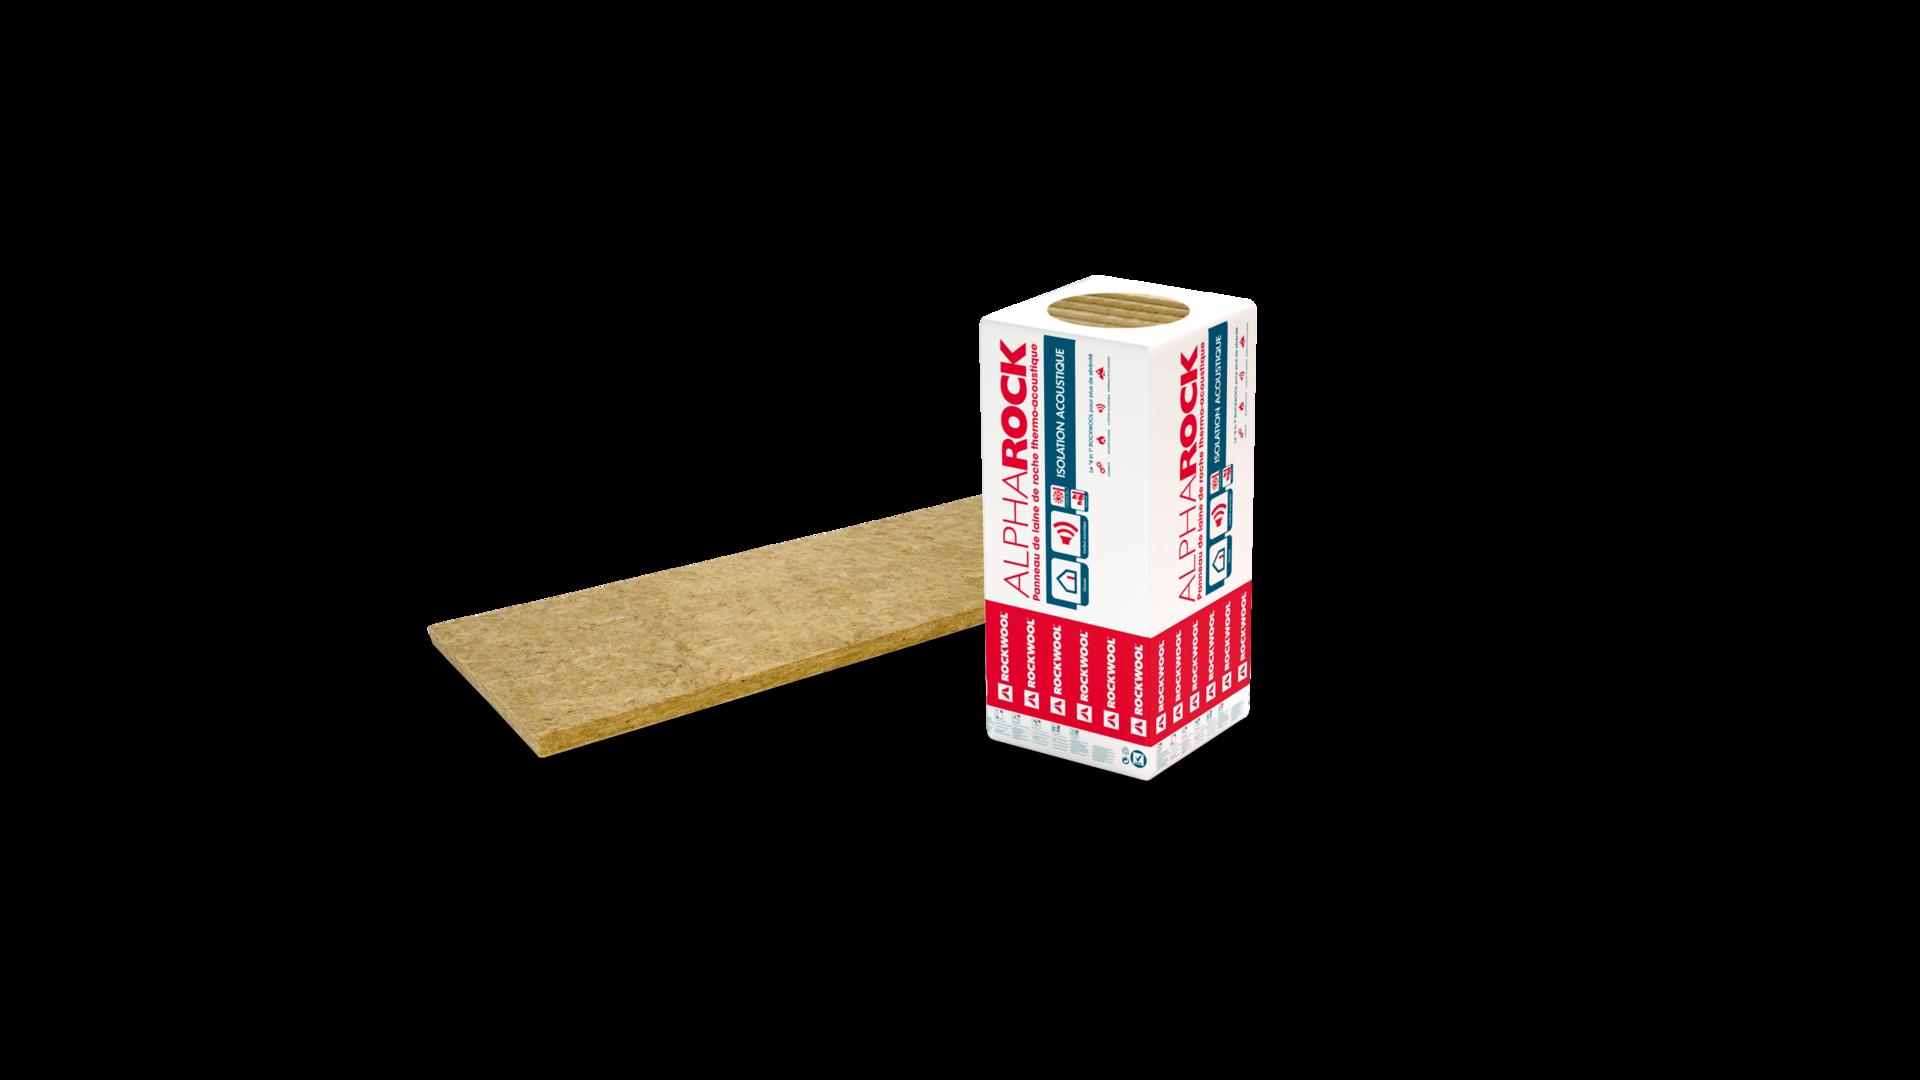 ALPHAROCK_emballage